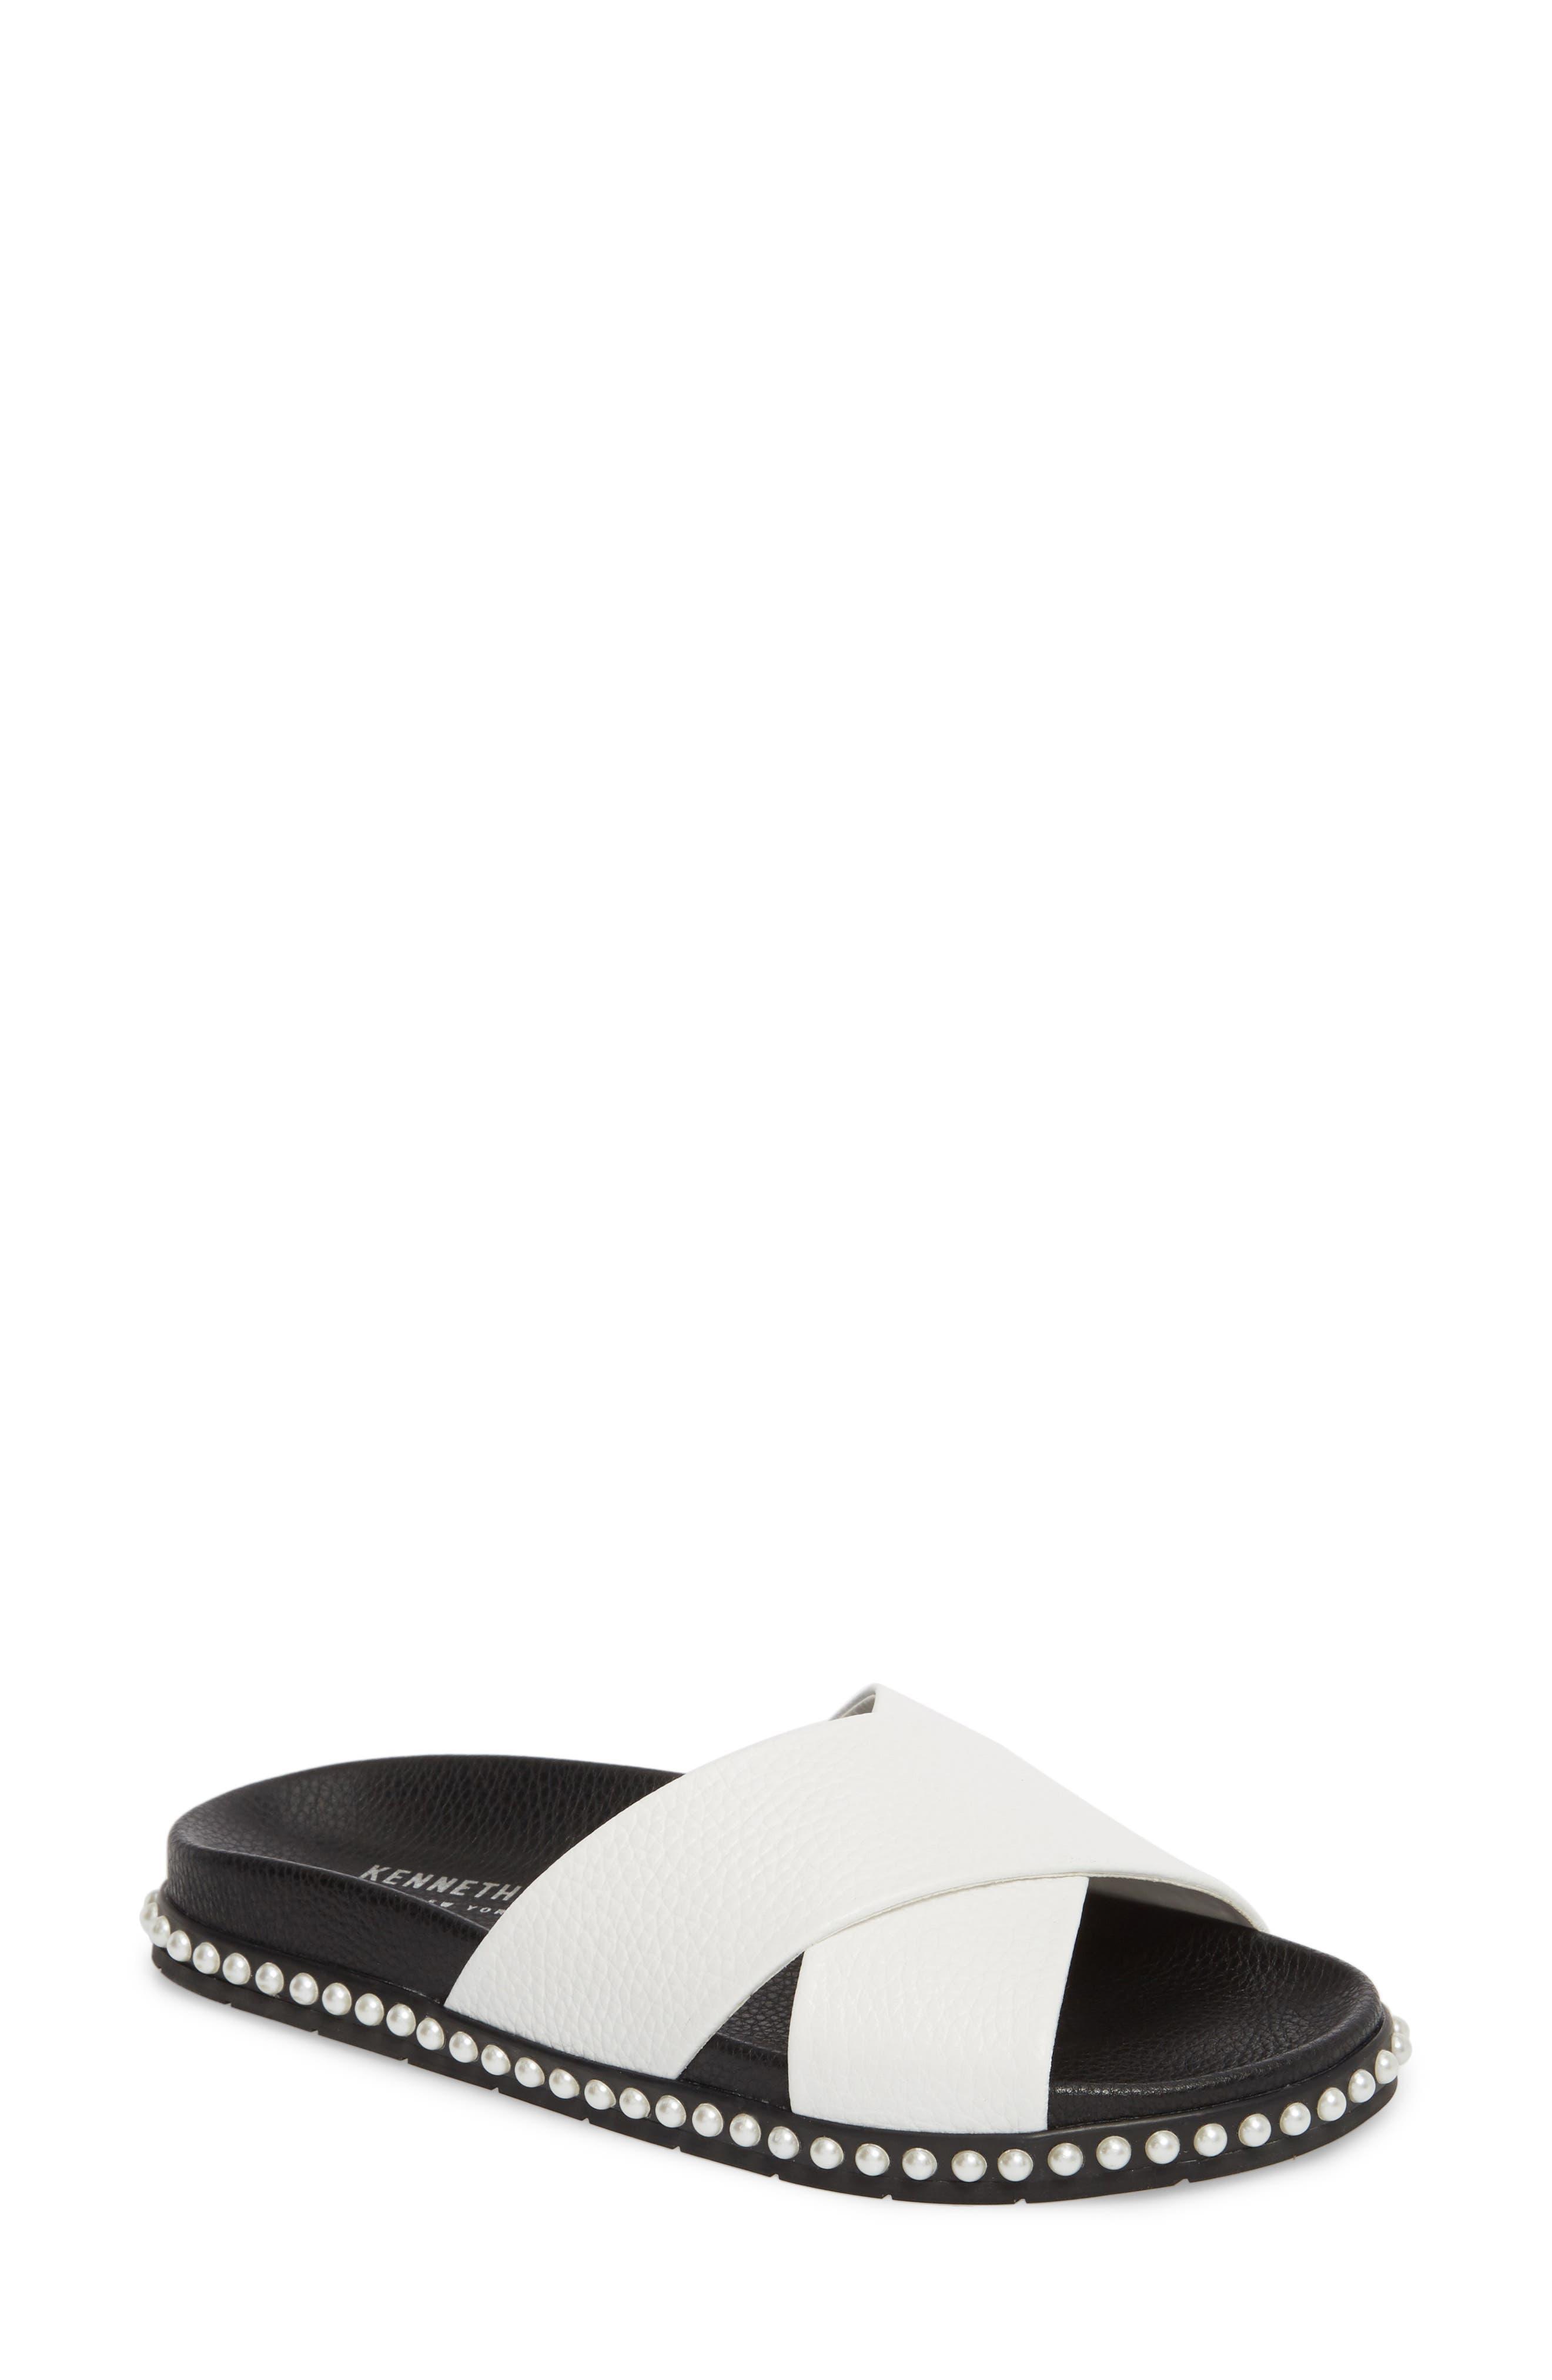 Xiomana Slide Sandal,                             Main thumbnail 1, color,                             White Leather